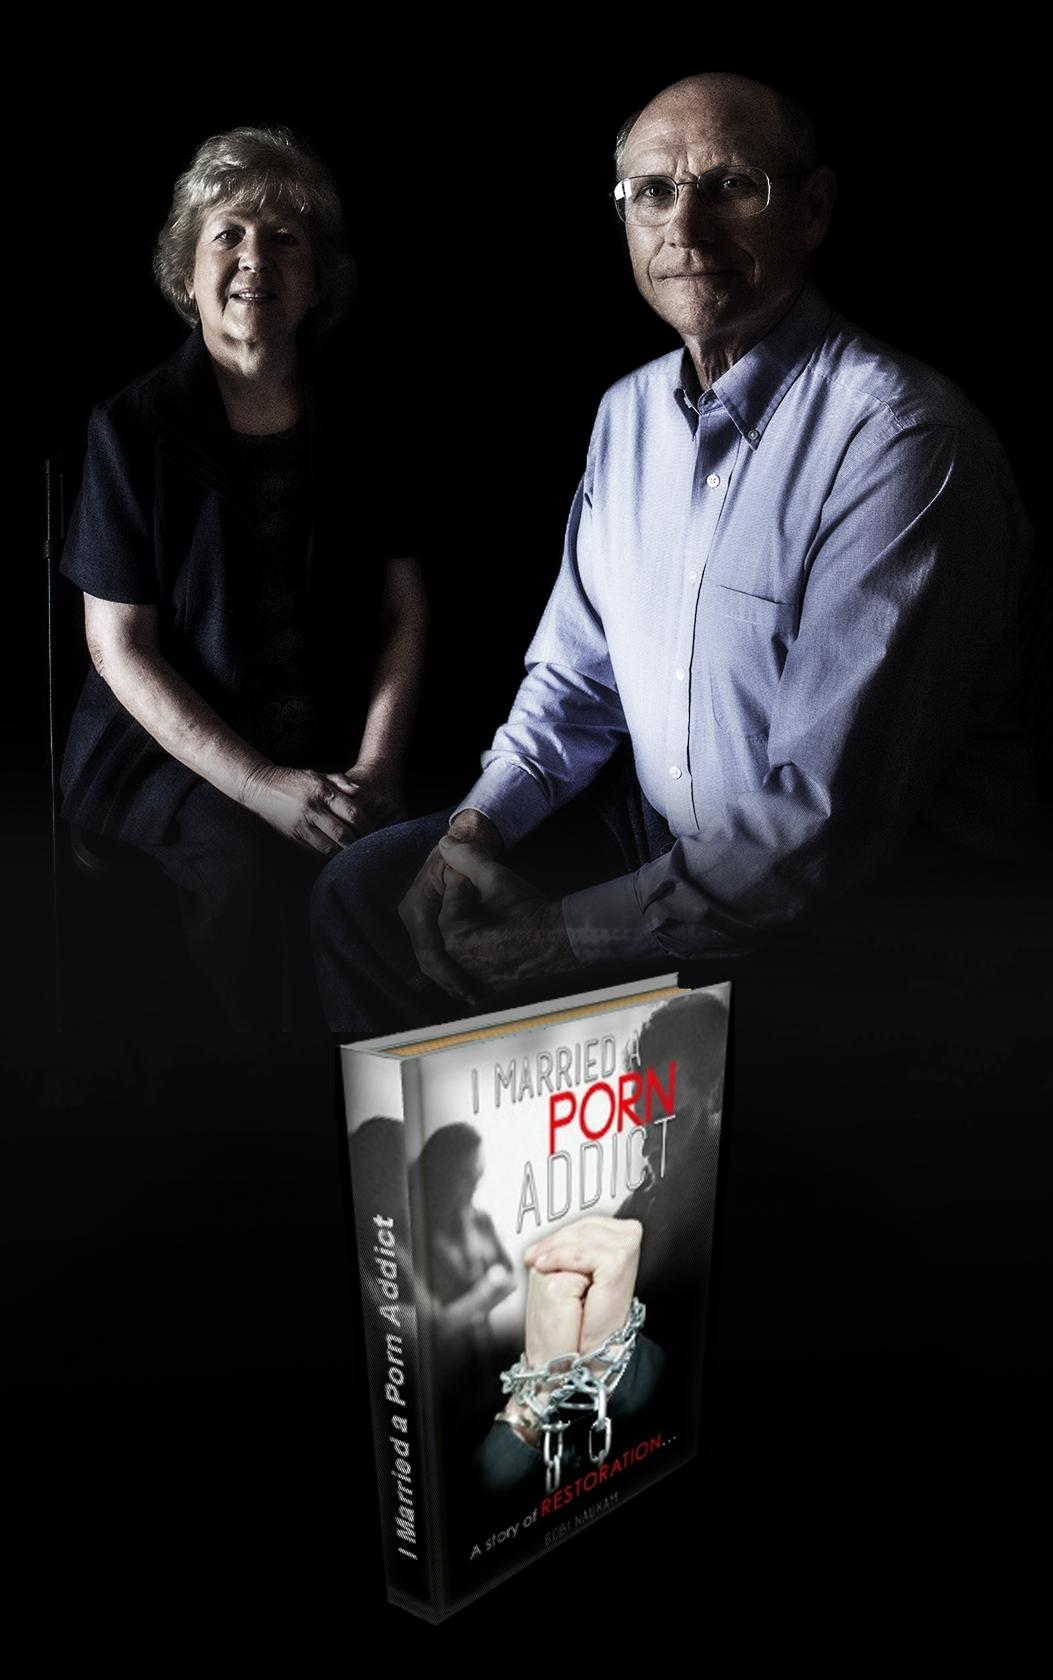 Phil Bobi Naukam sitting with book